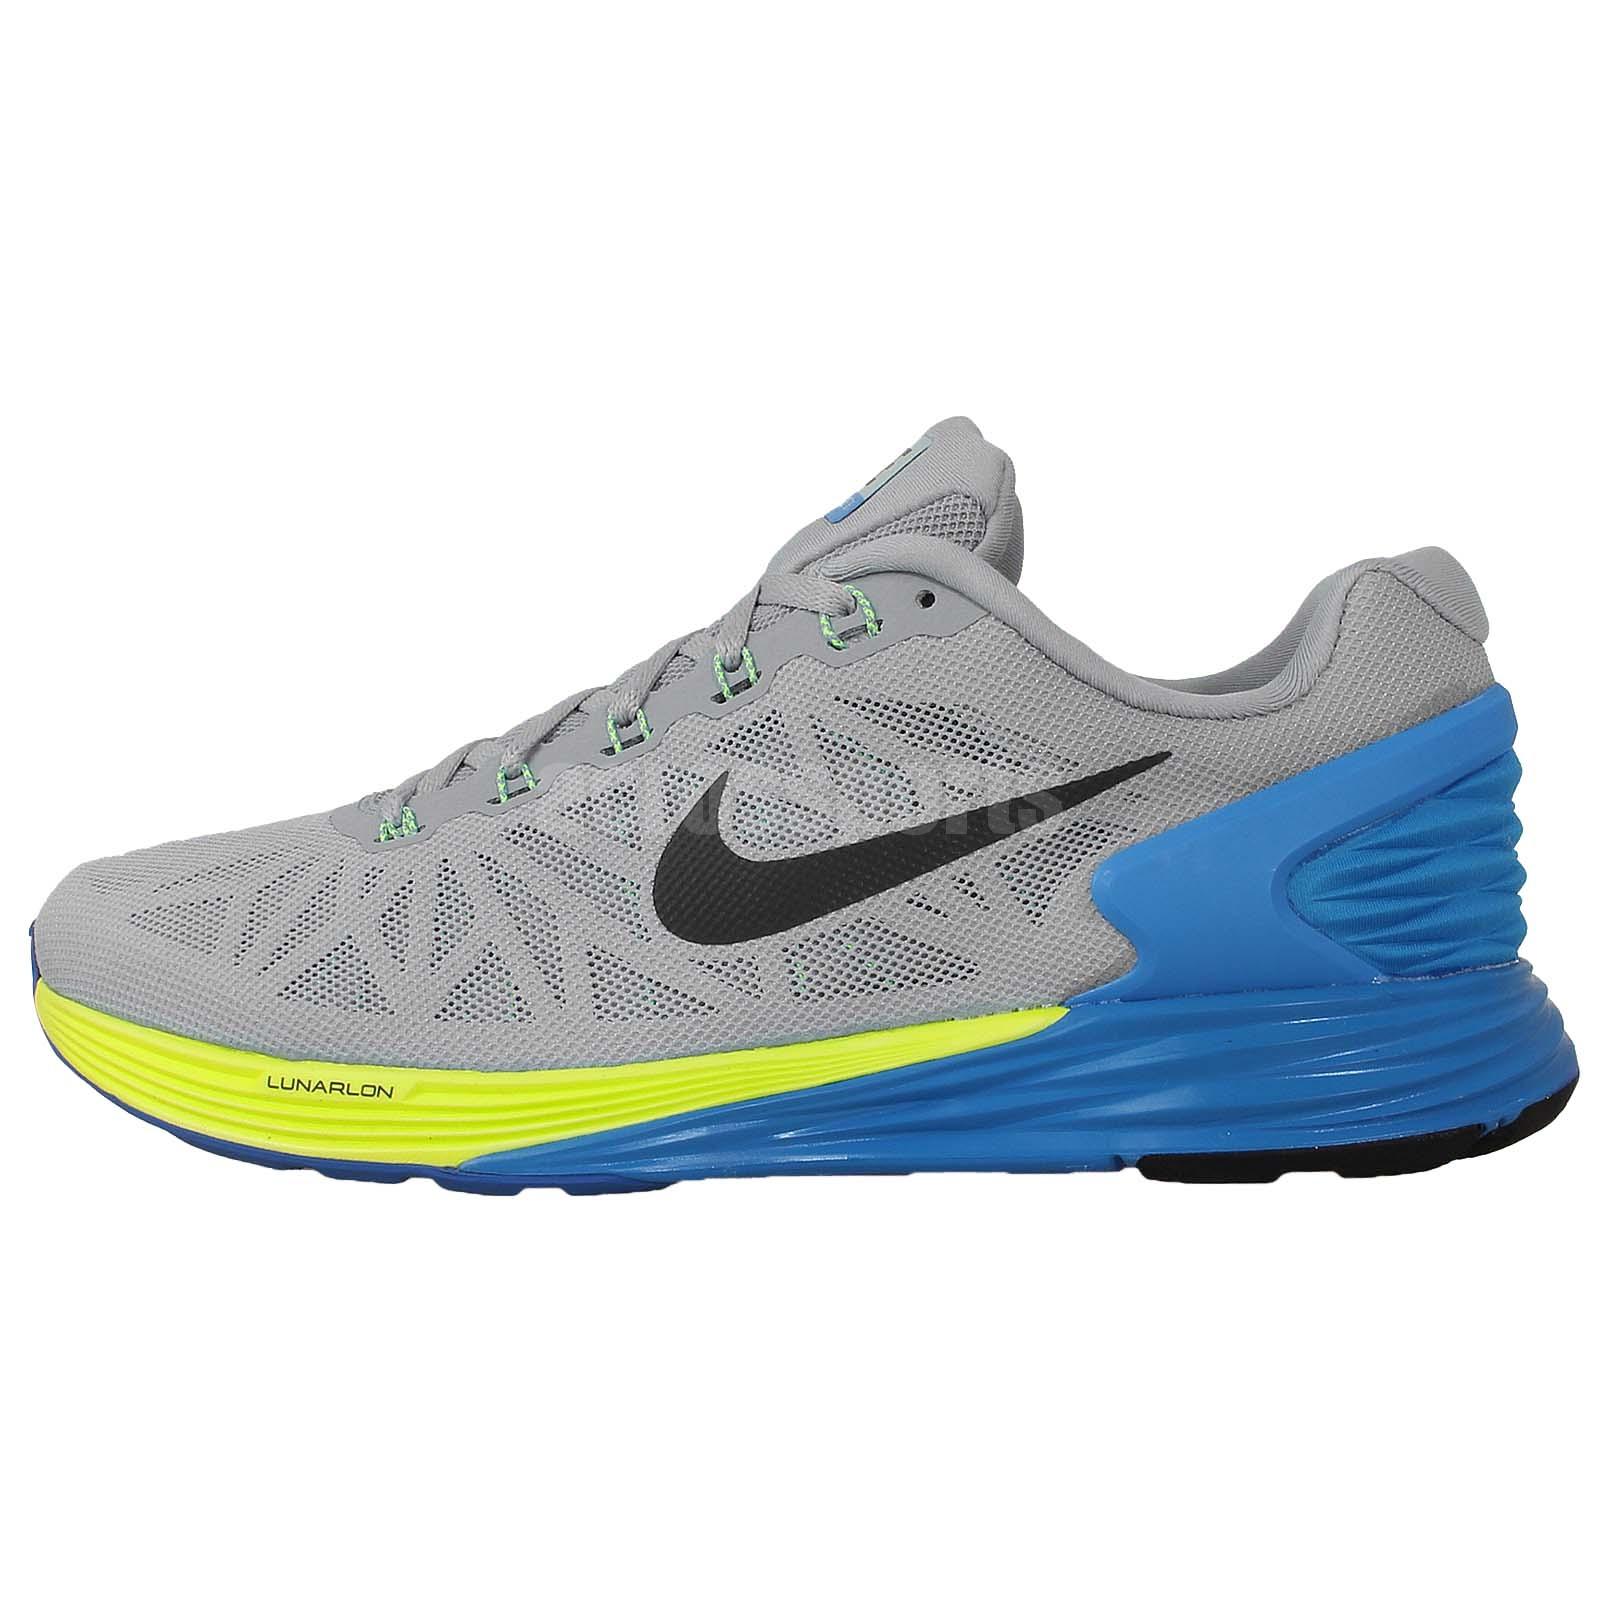 Nike Lunarglide 6 Grey Blue 2014 Mens Jogging Running ...